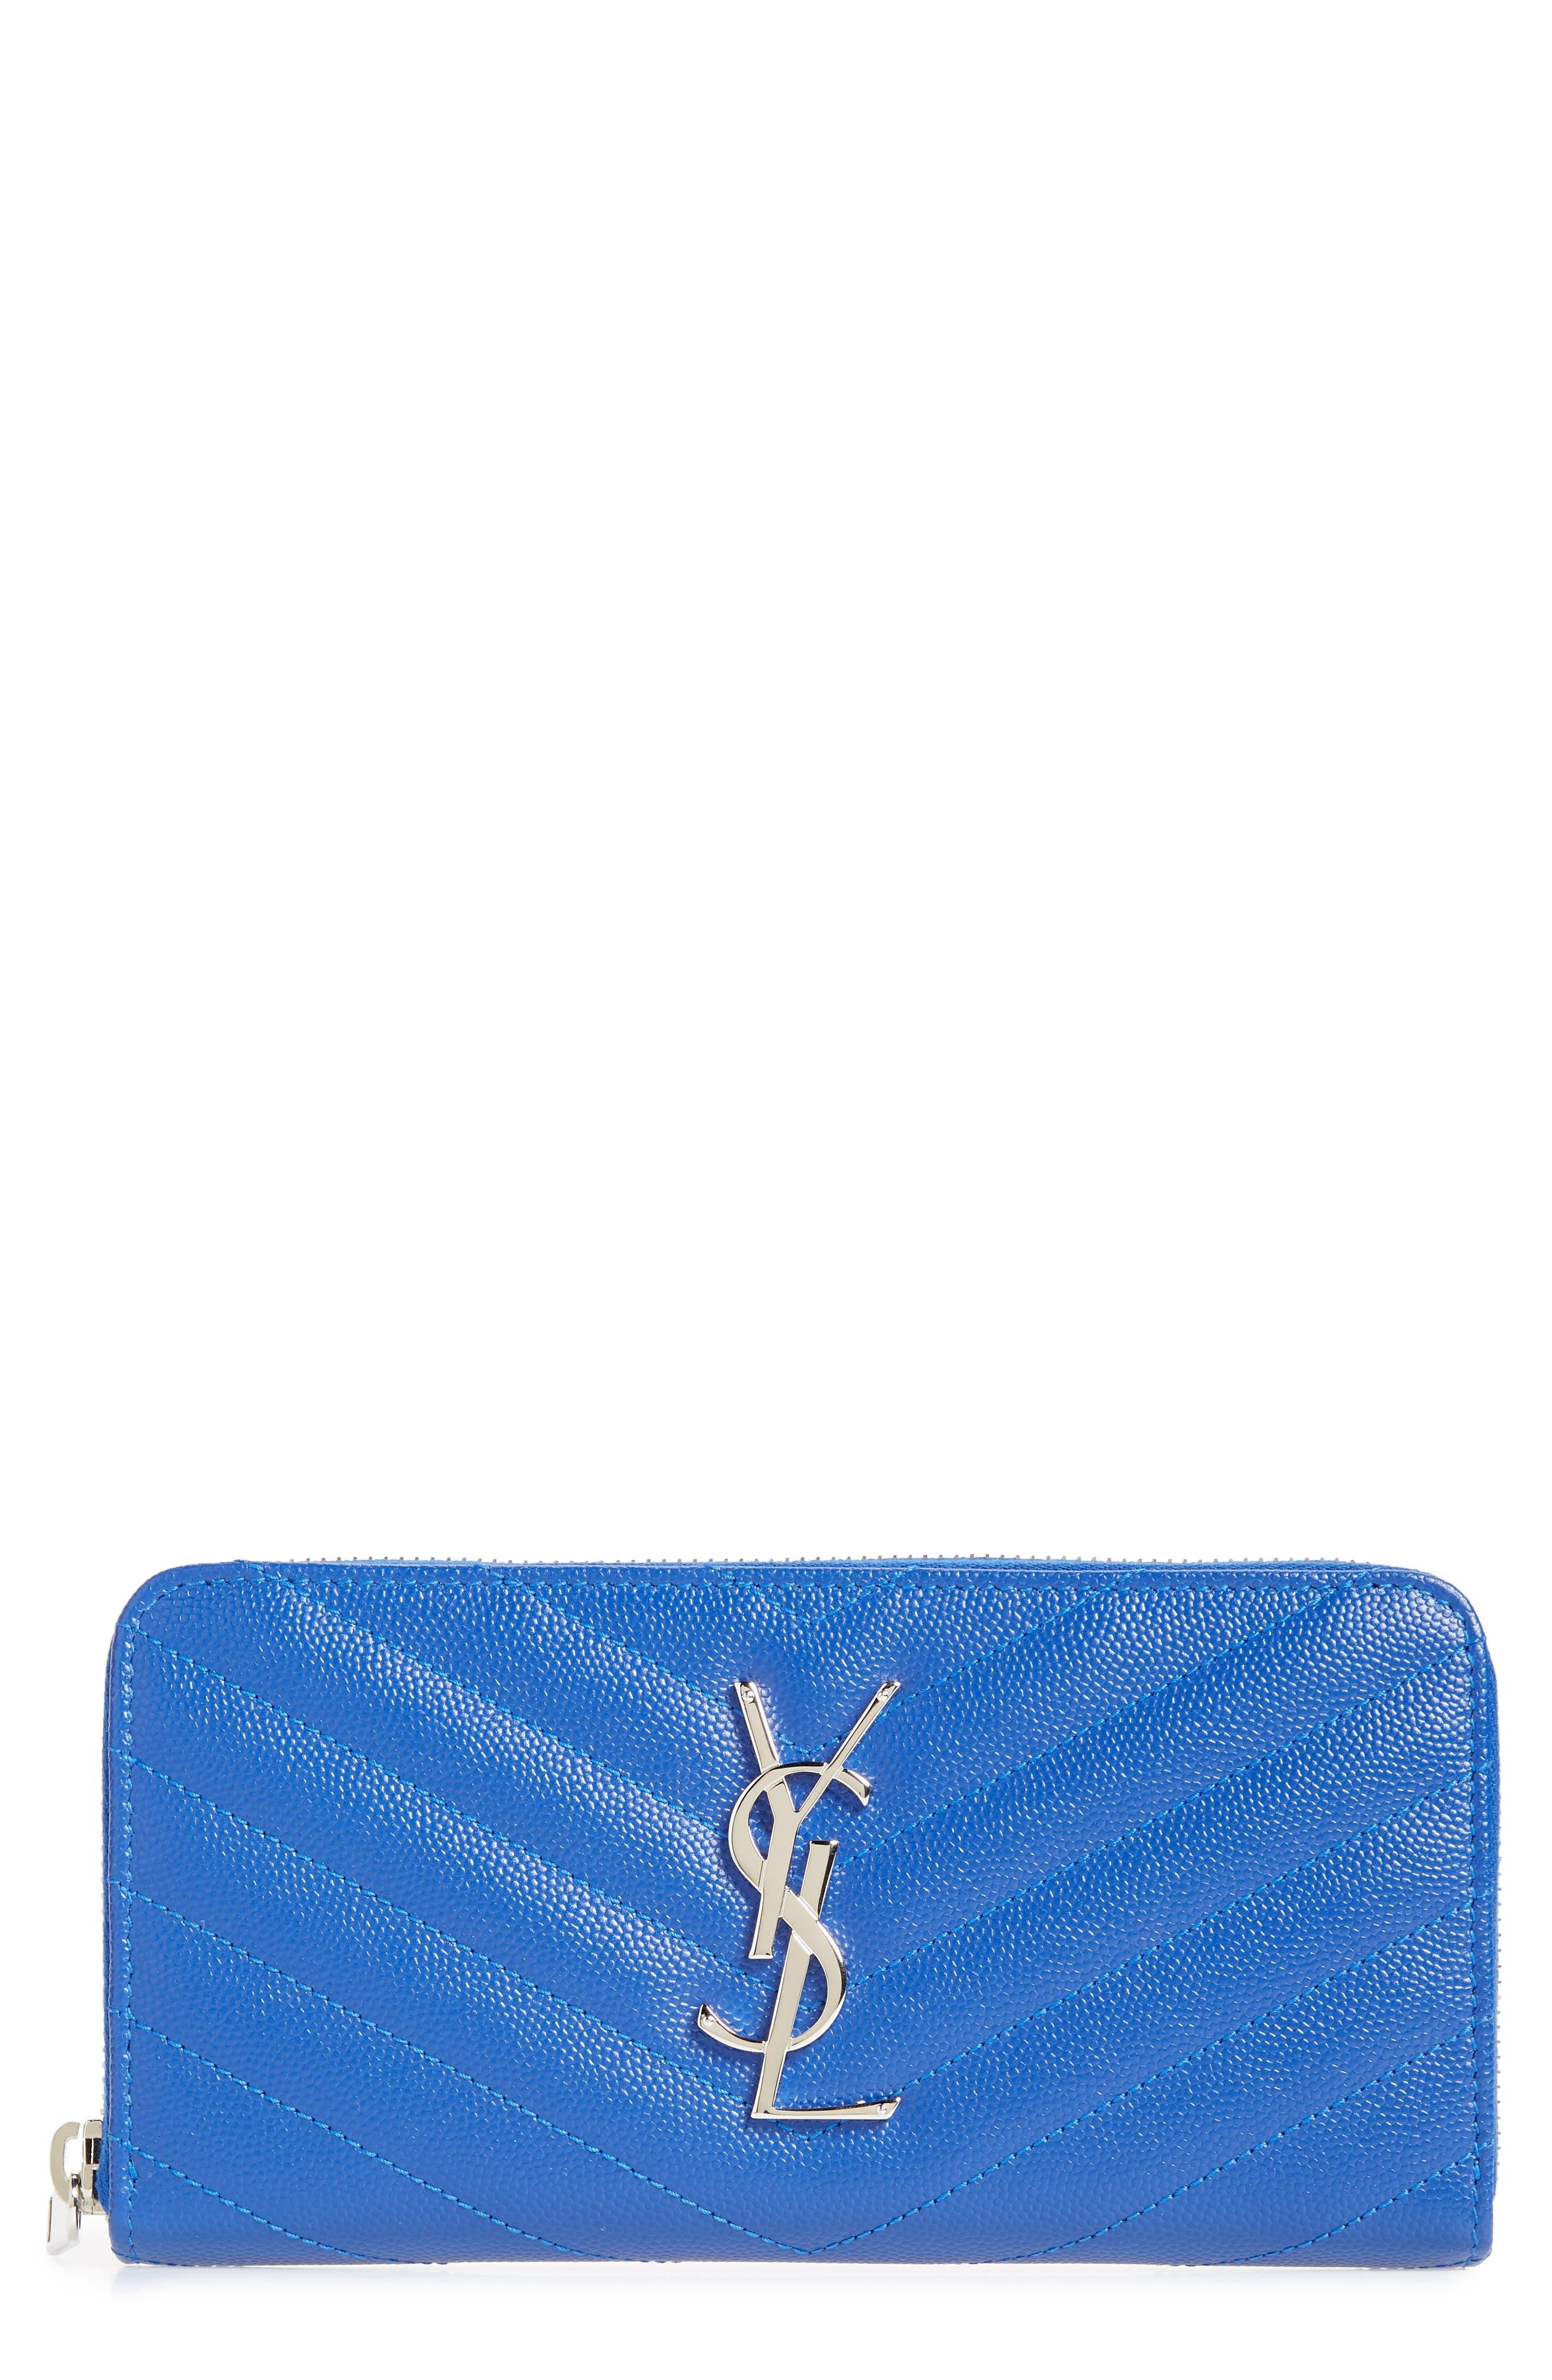 SAINT LAURENT 'Monogram' Zip Around Quilted Calfskin Leather Wallet, Main, color, BRIGHT BLUE